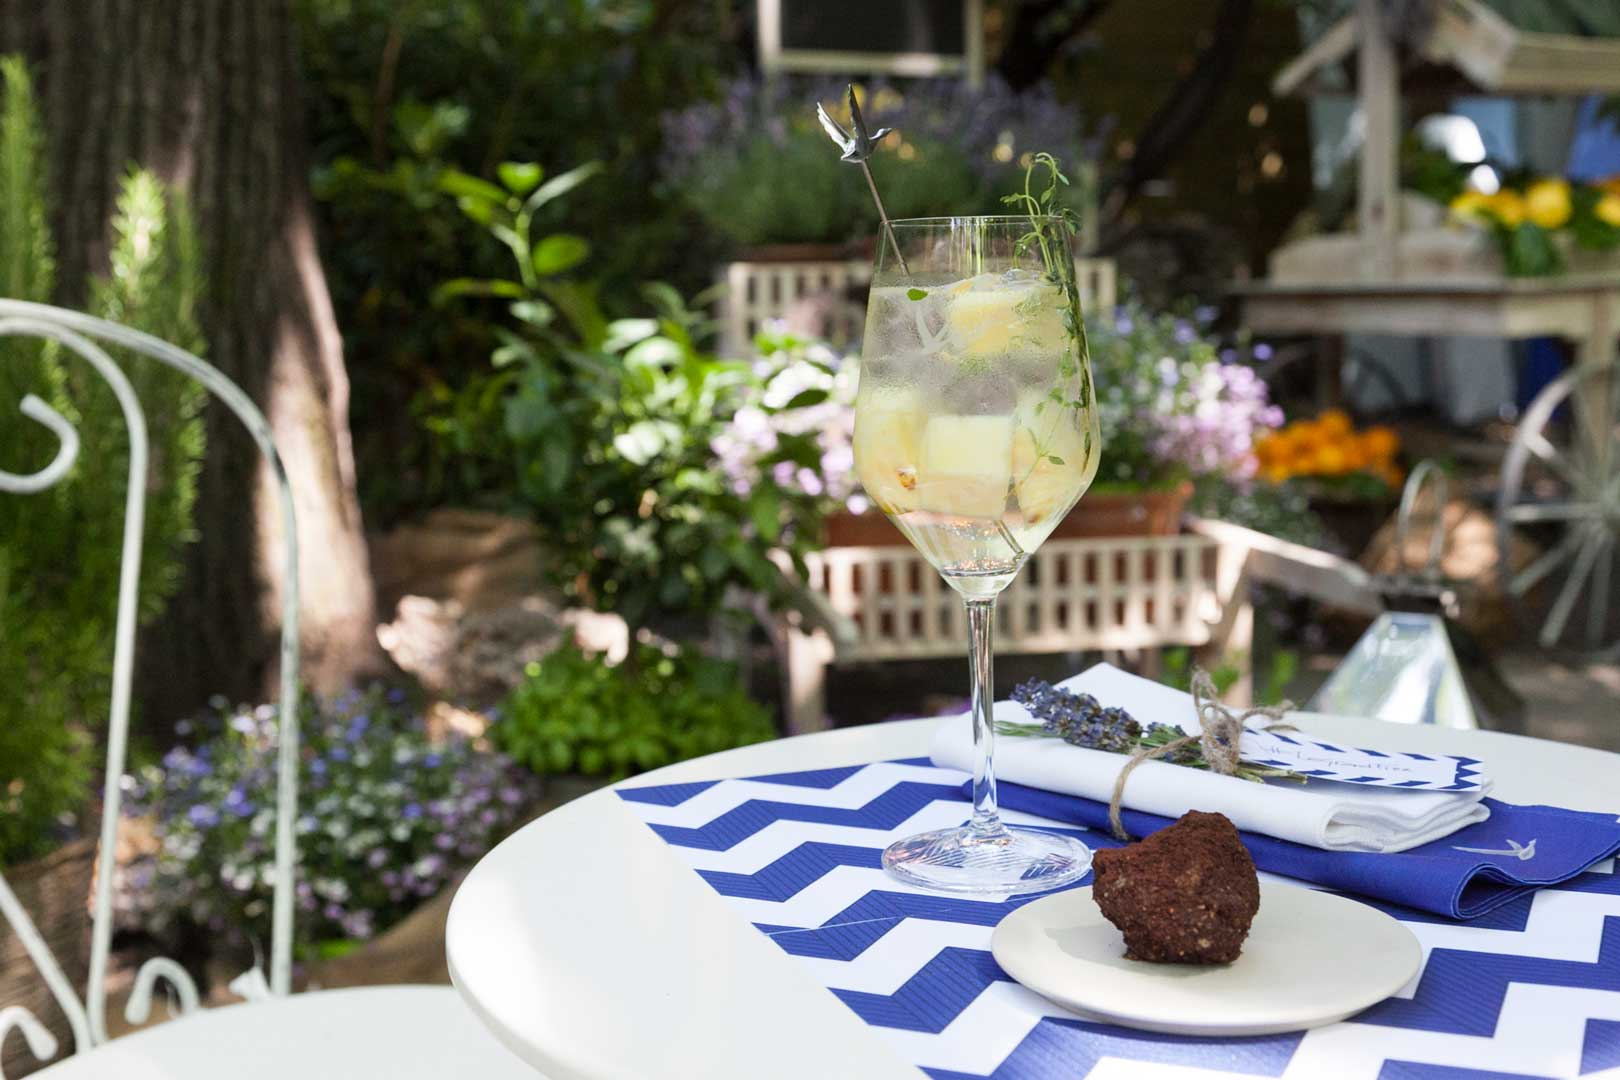 Grey Goose Atelier of Taste @ Sheraton Diana Majestic | Cocktail